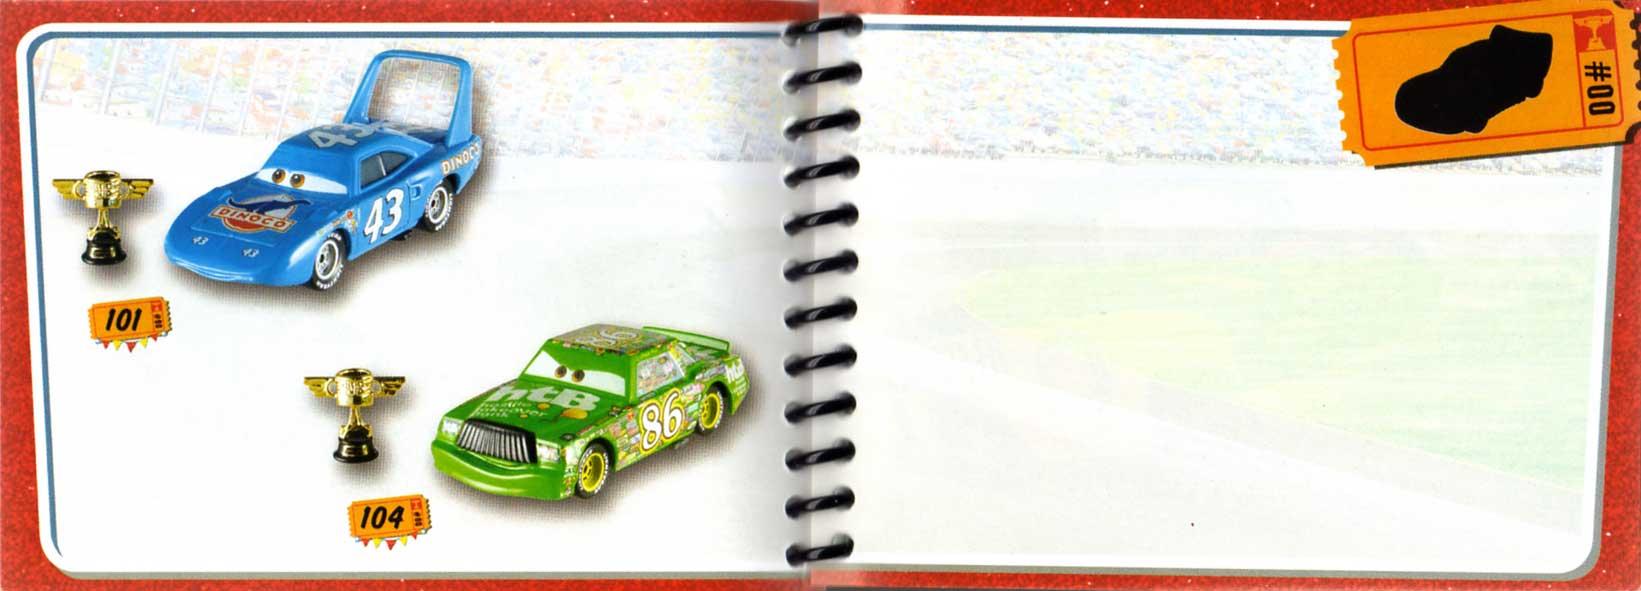 Catalogue Race O Rama page 32 - 33